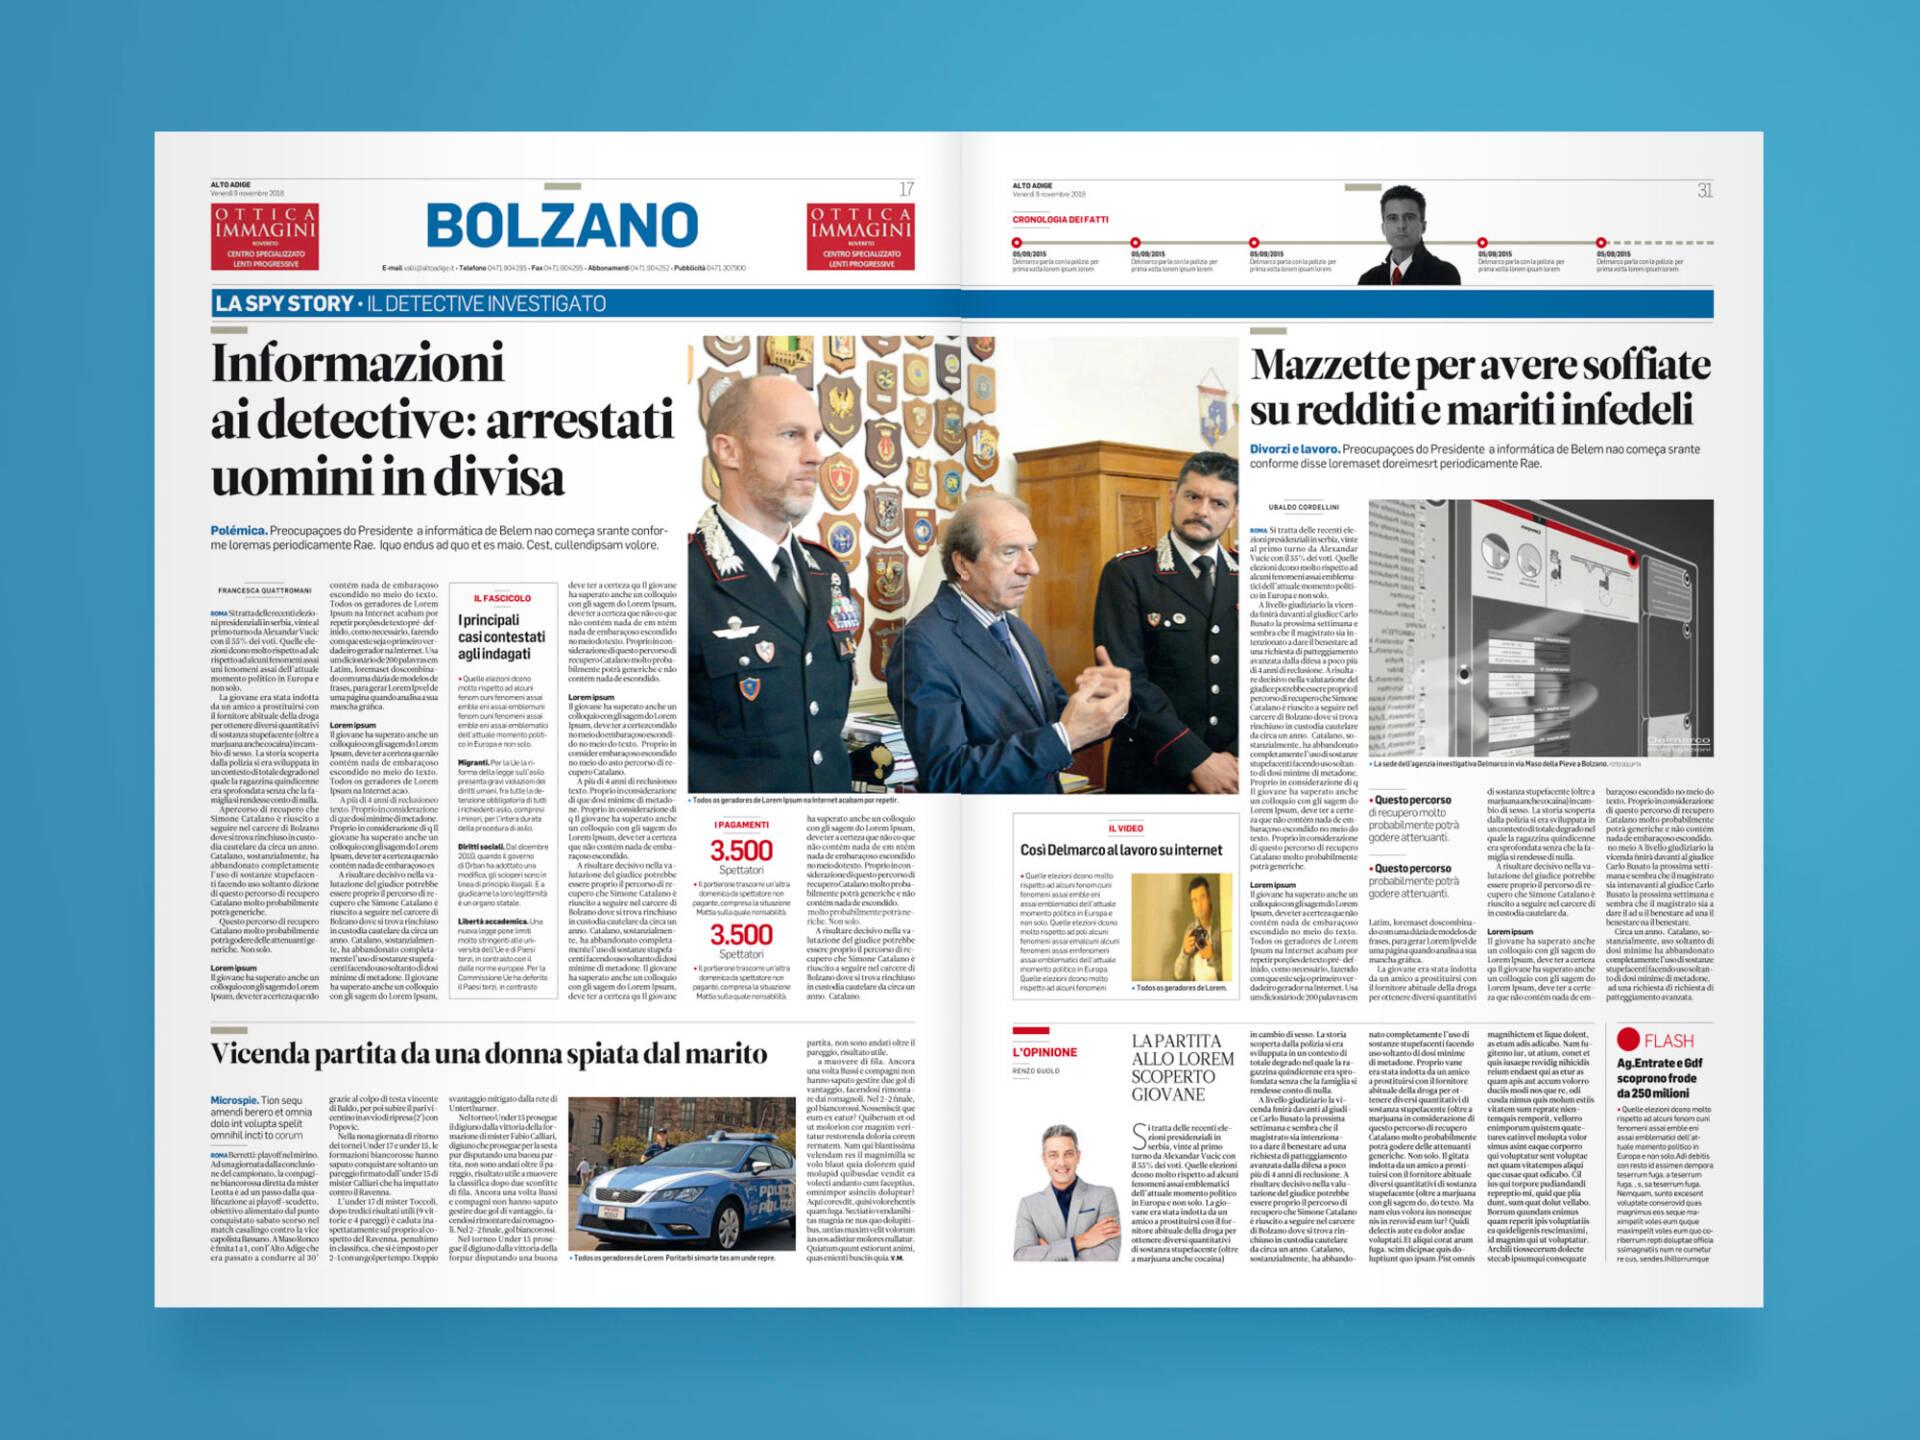 Alto_Adige_09a_Wenceslau_News_Design